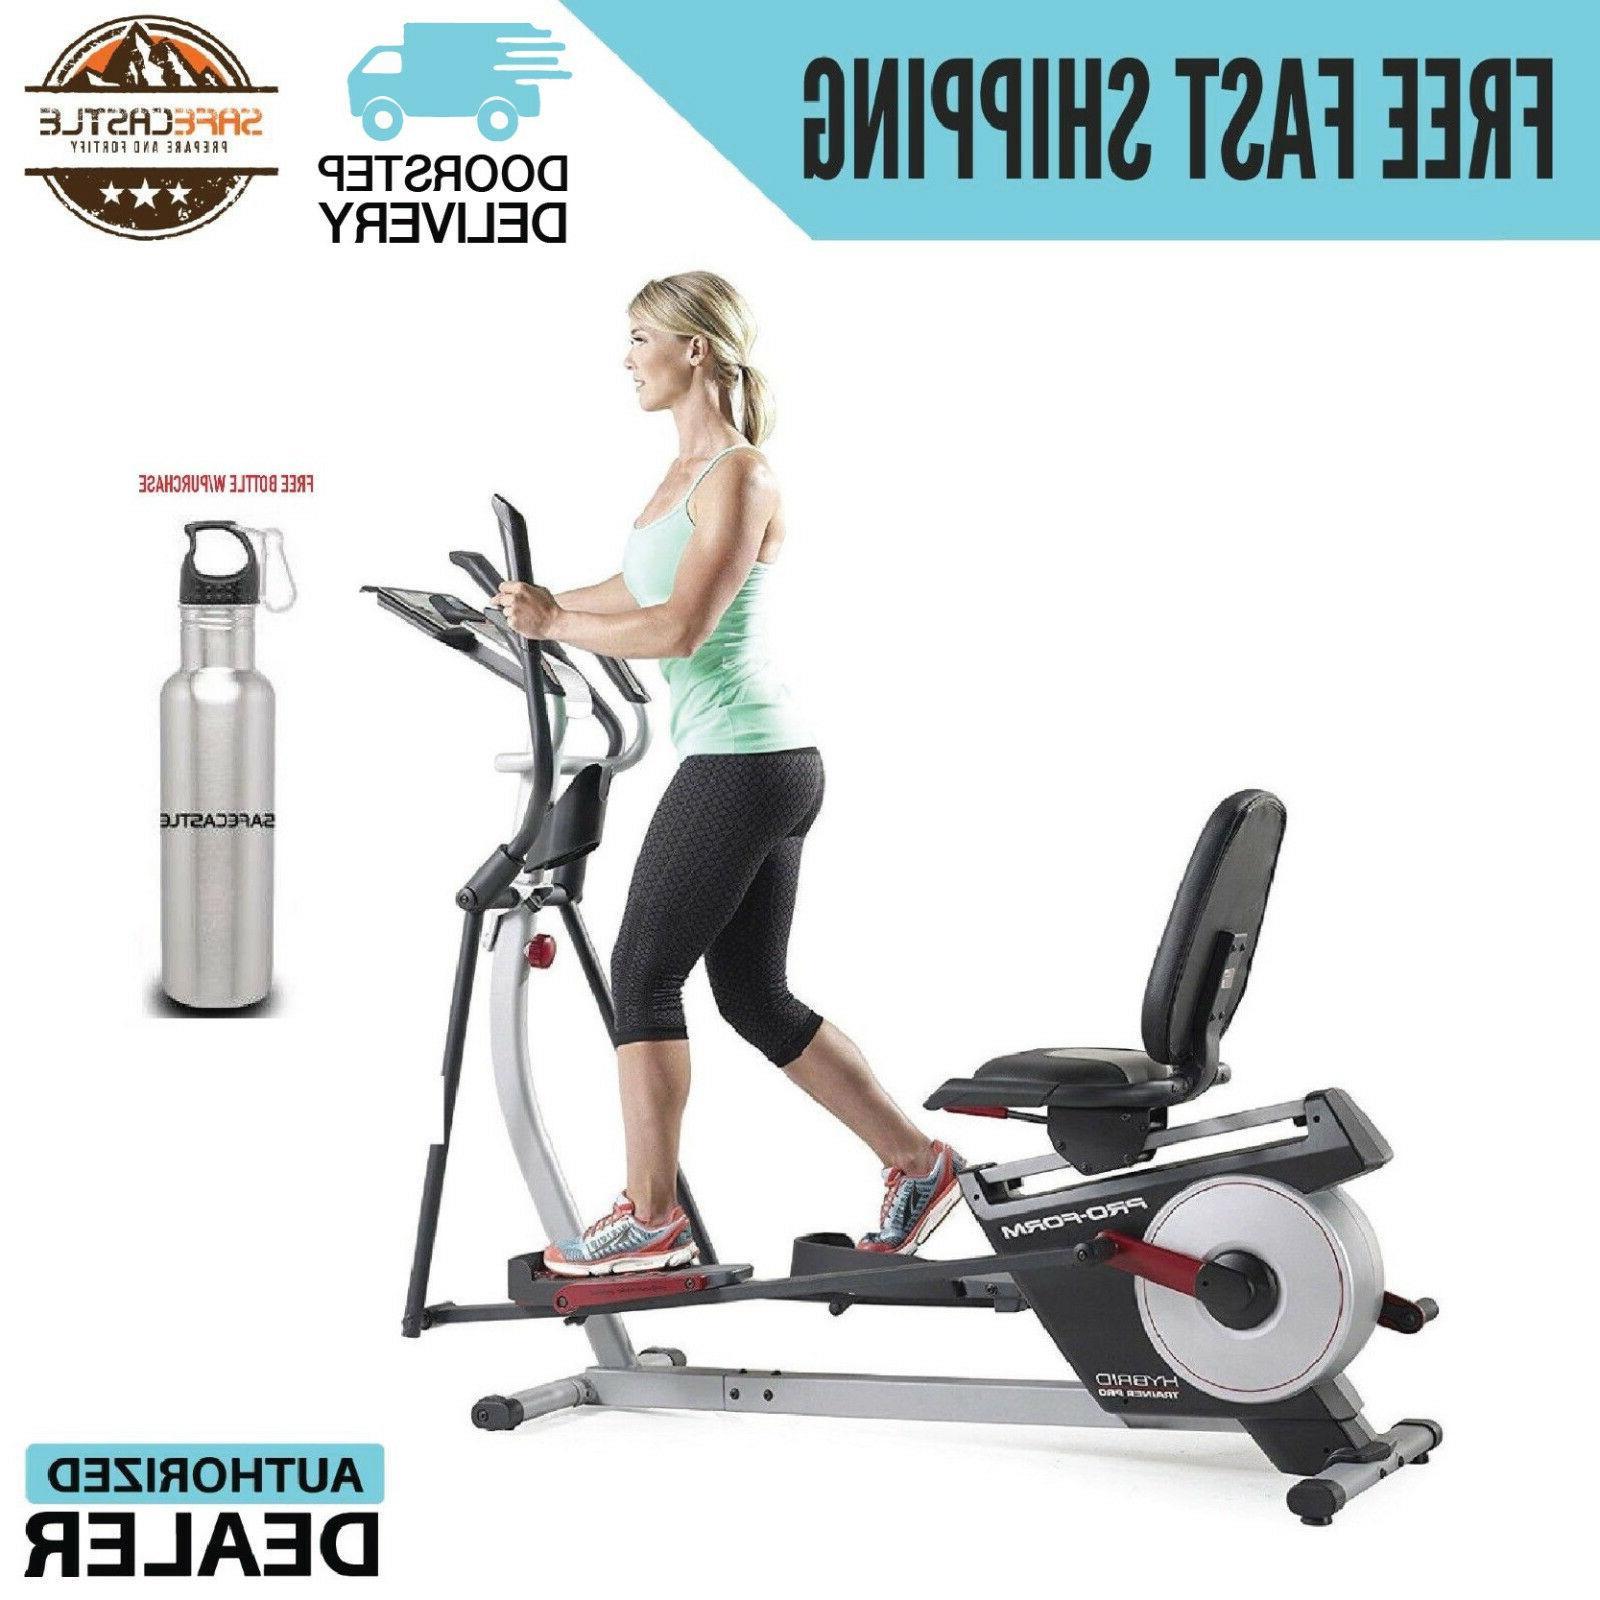 new hybrid trainer pro elliptical machine pfel05815